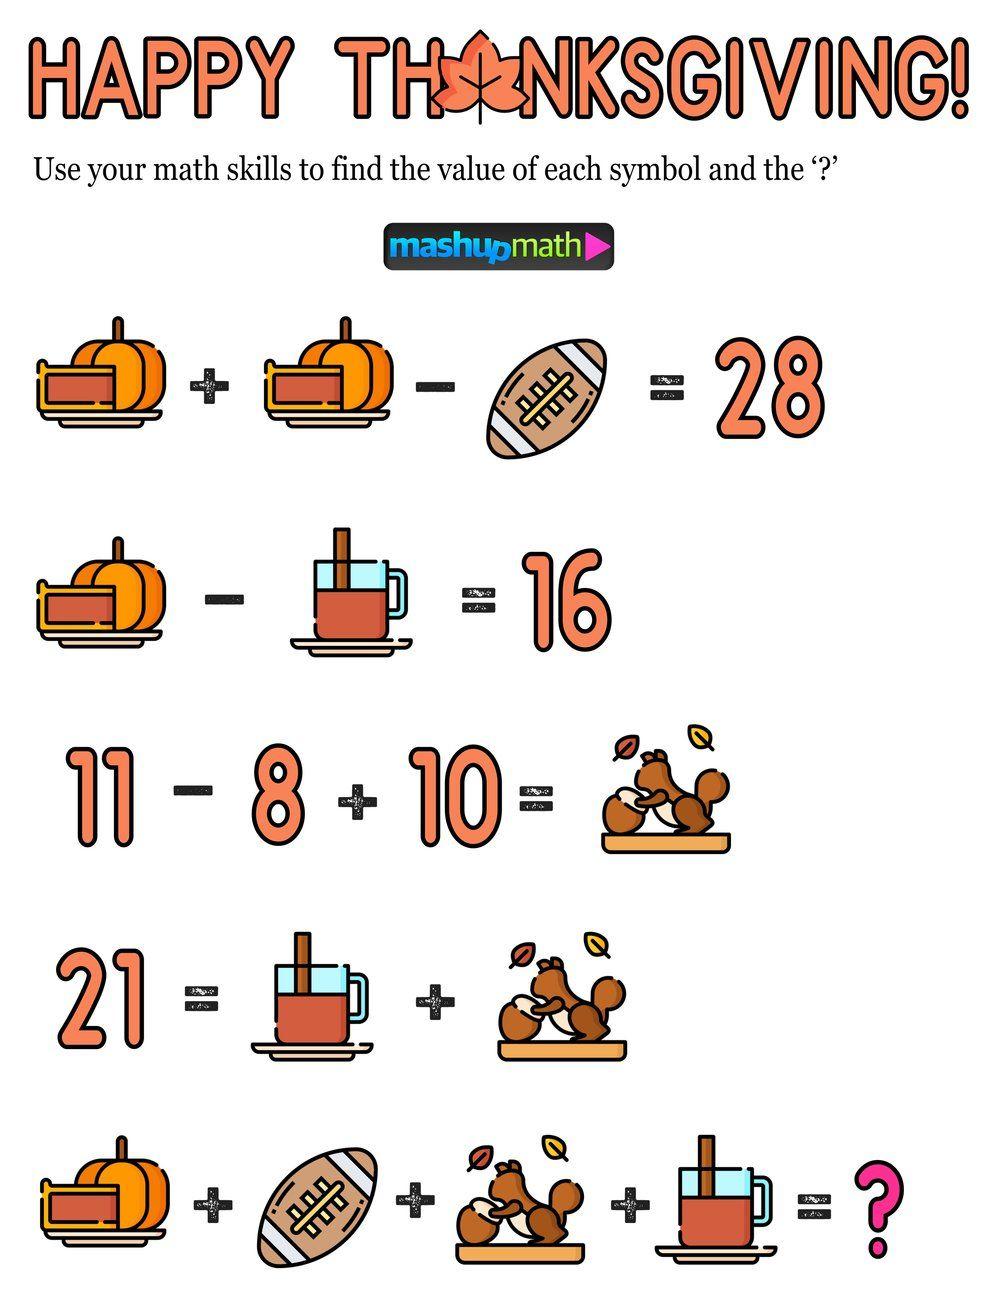 12 Thanksgiving Math Activities For Grades 1 8 Mashup Math Thanksgiving Math Thanksgiving Math Activities Math